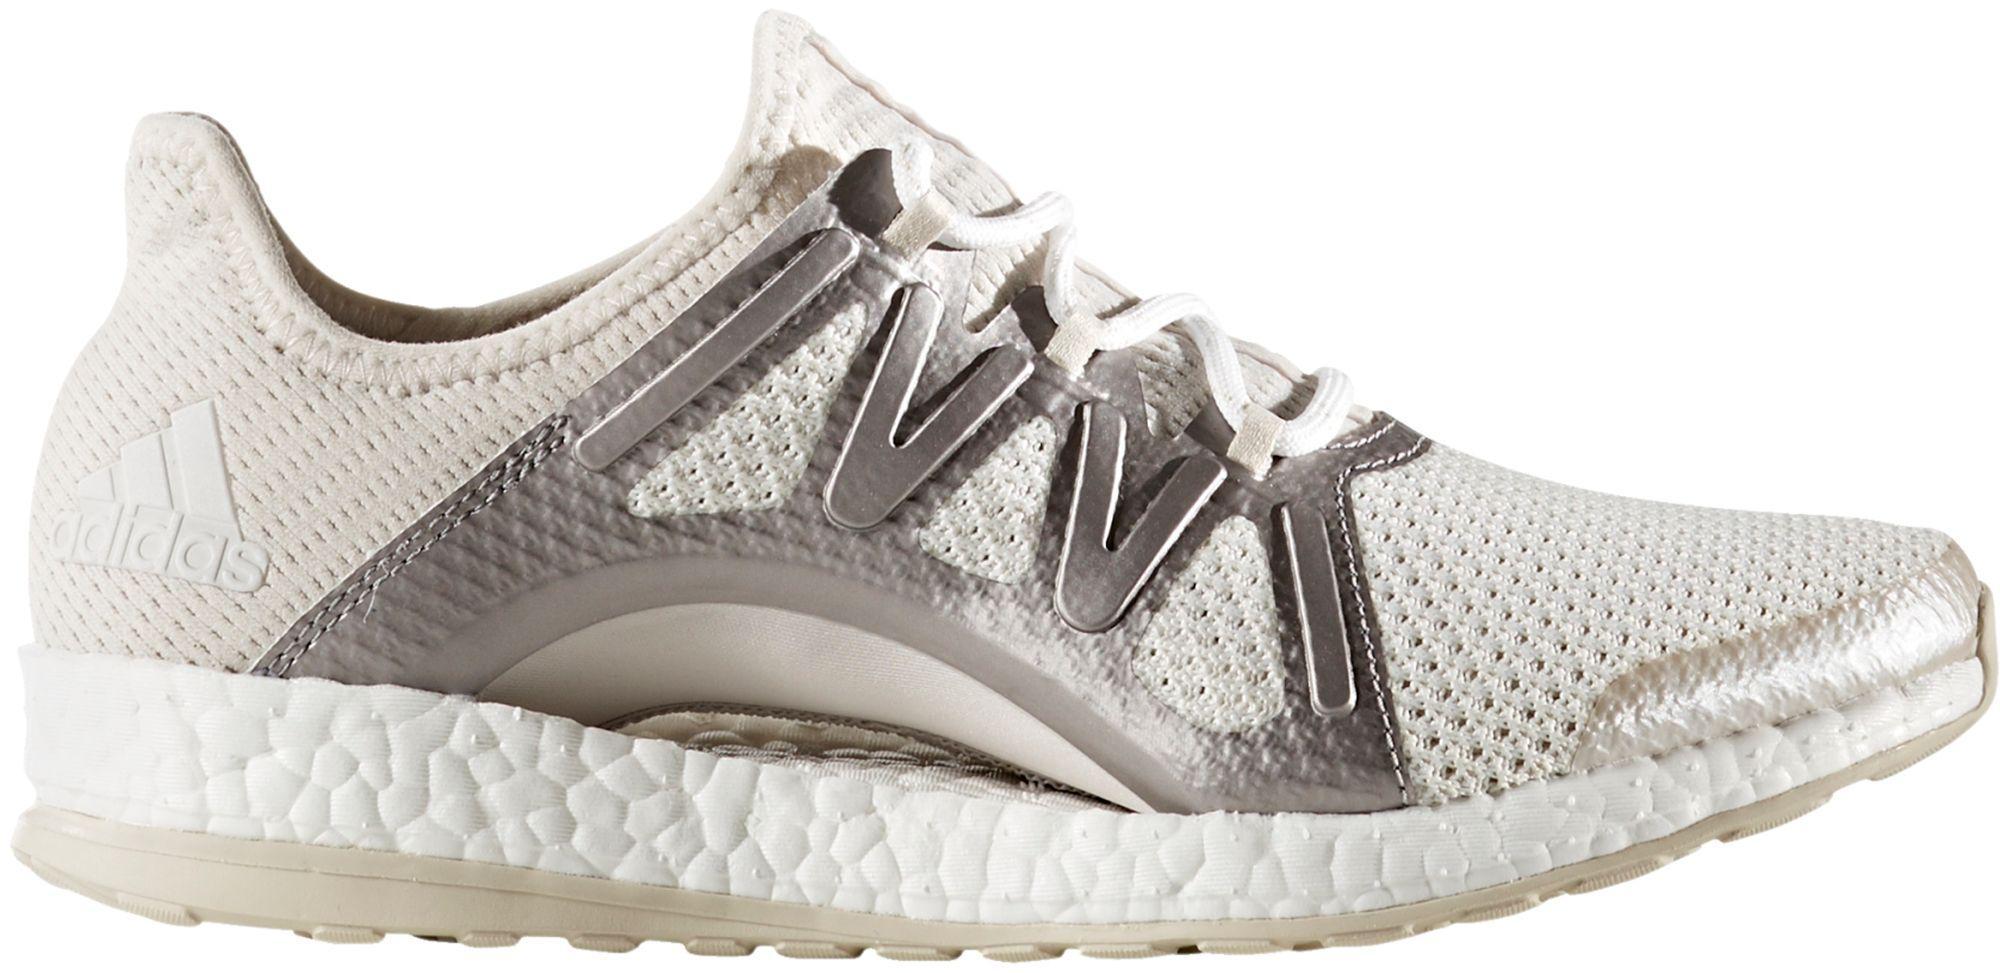 lyst adidas pureboost xpose scarpe marroni